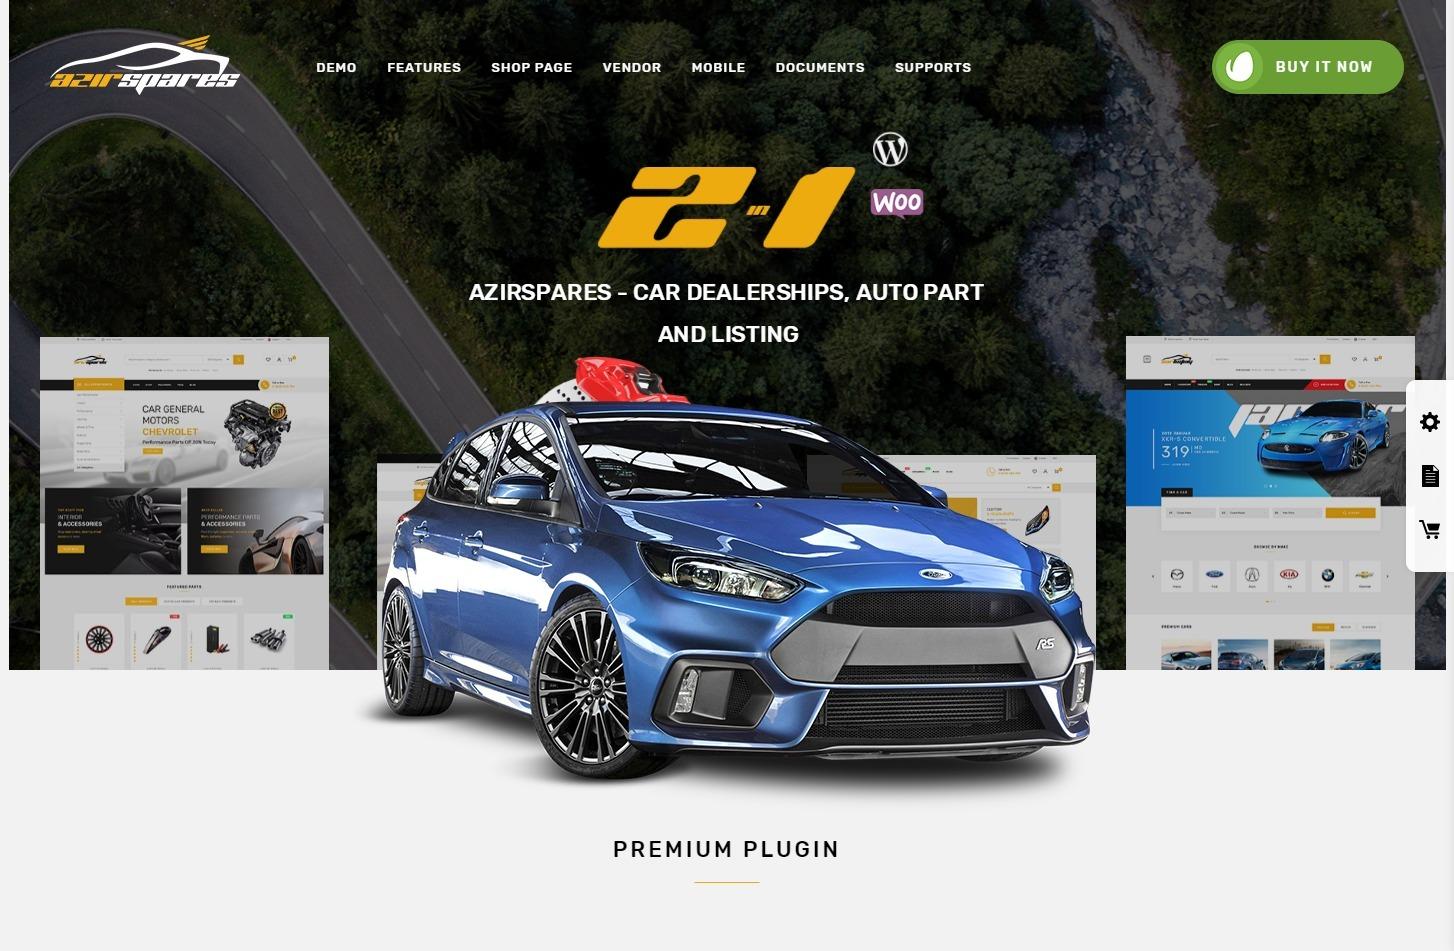 Azirspares Auto Parts and Auto Dealership WordPress Theme